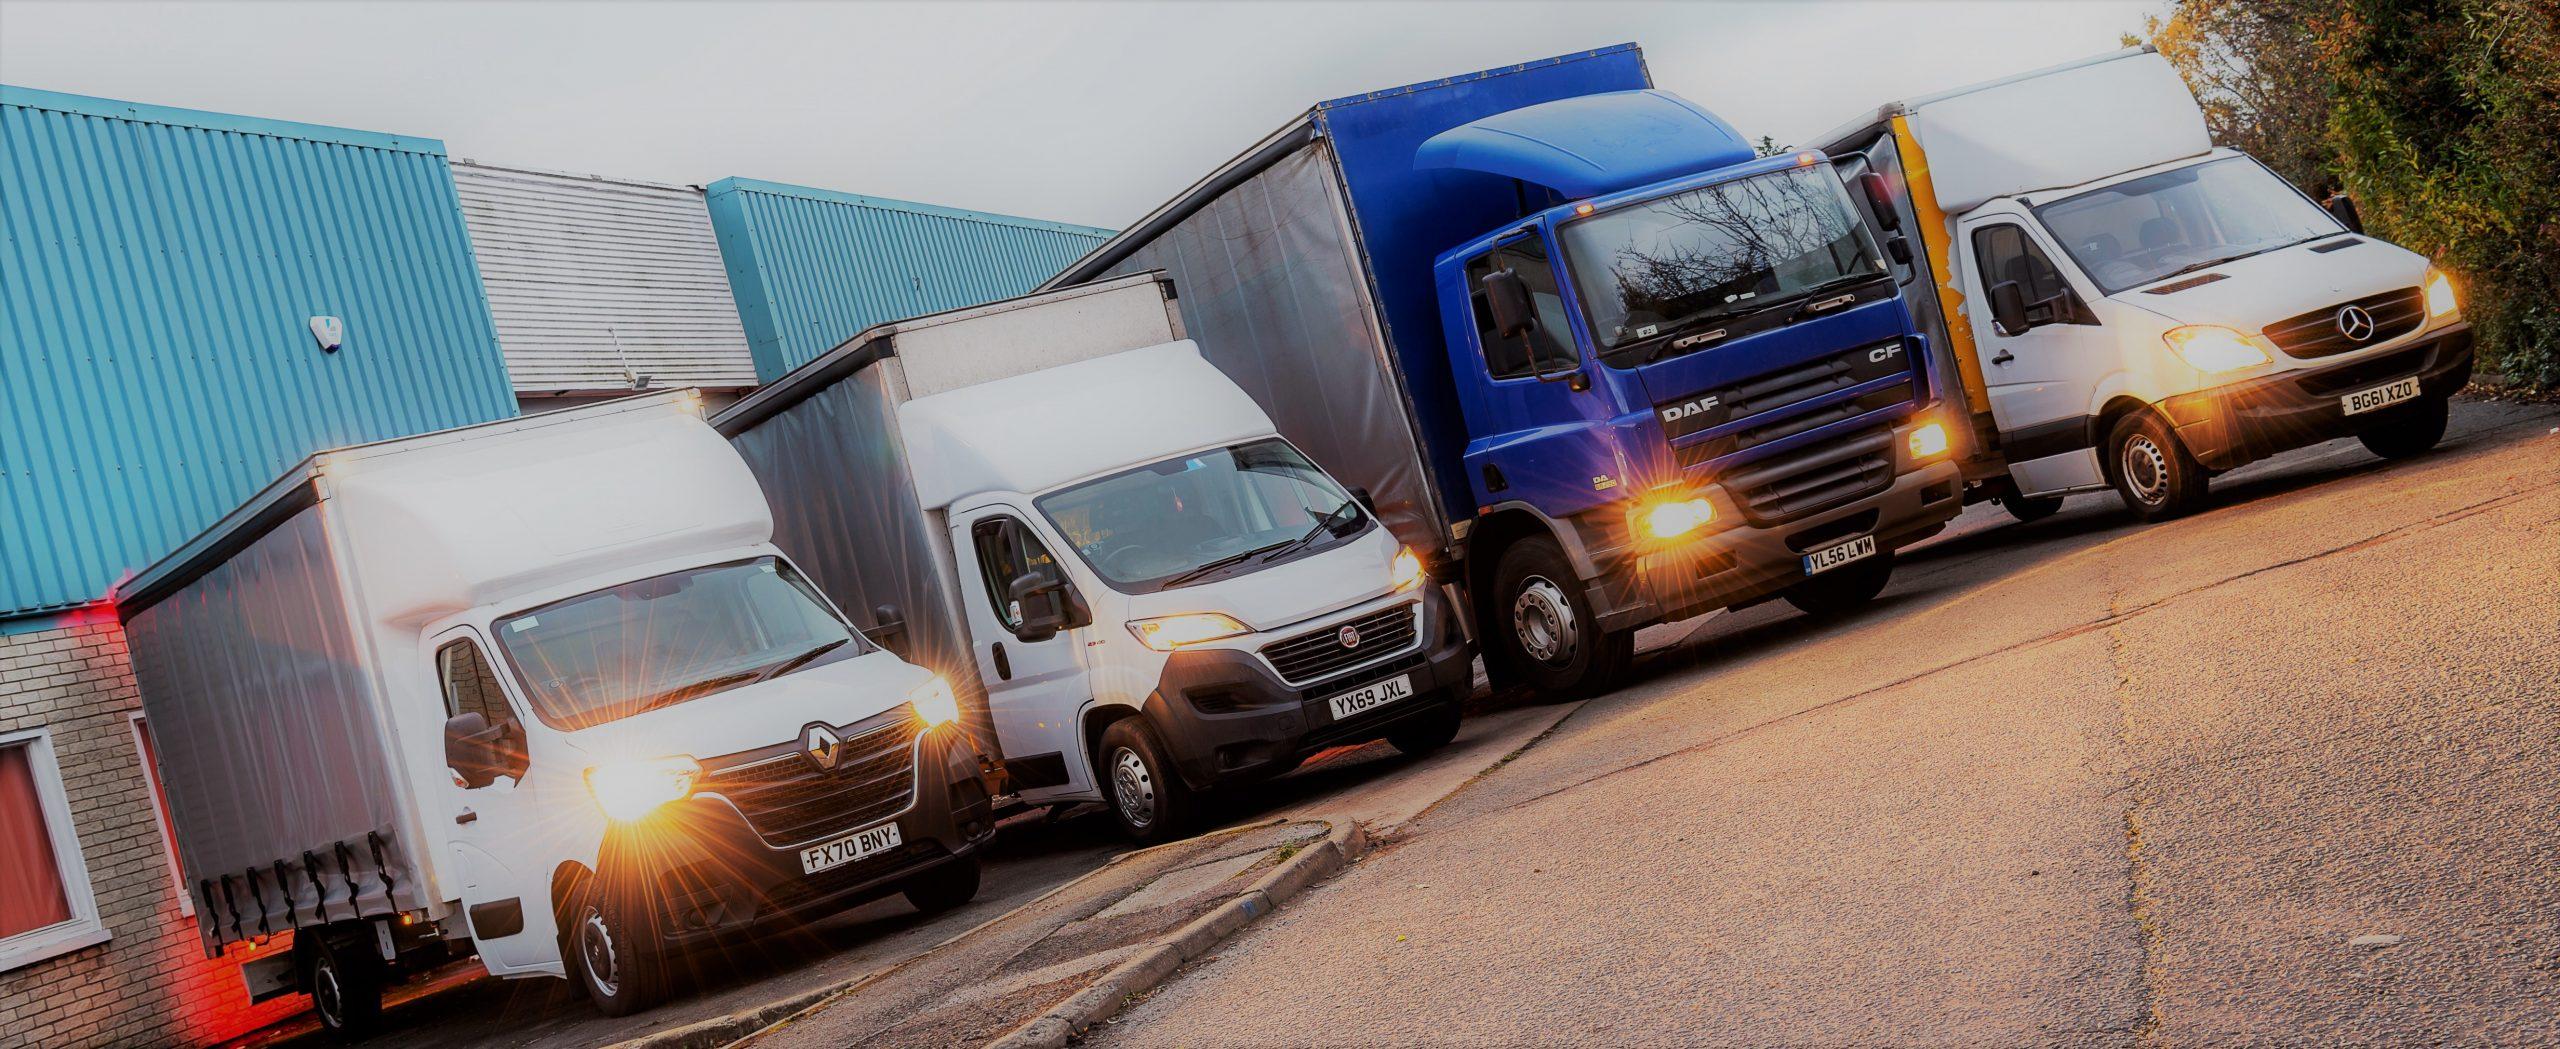 S L Packaging & Transport Vehicle Fleet